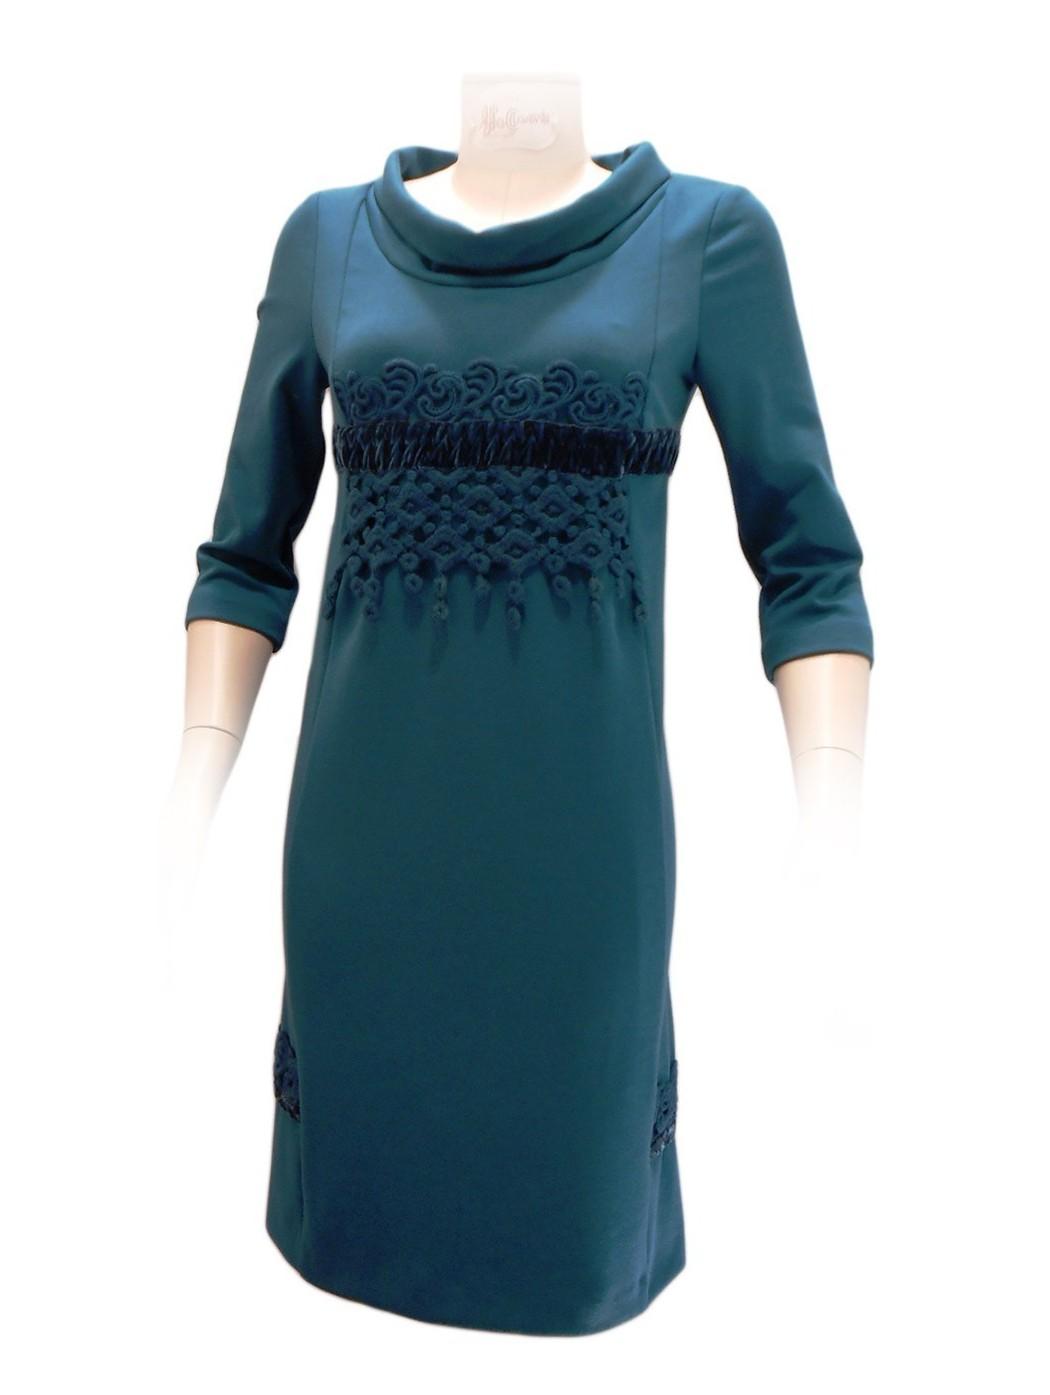 Green dress by Carmen Gherardi